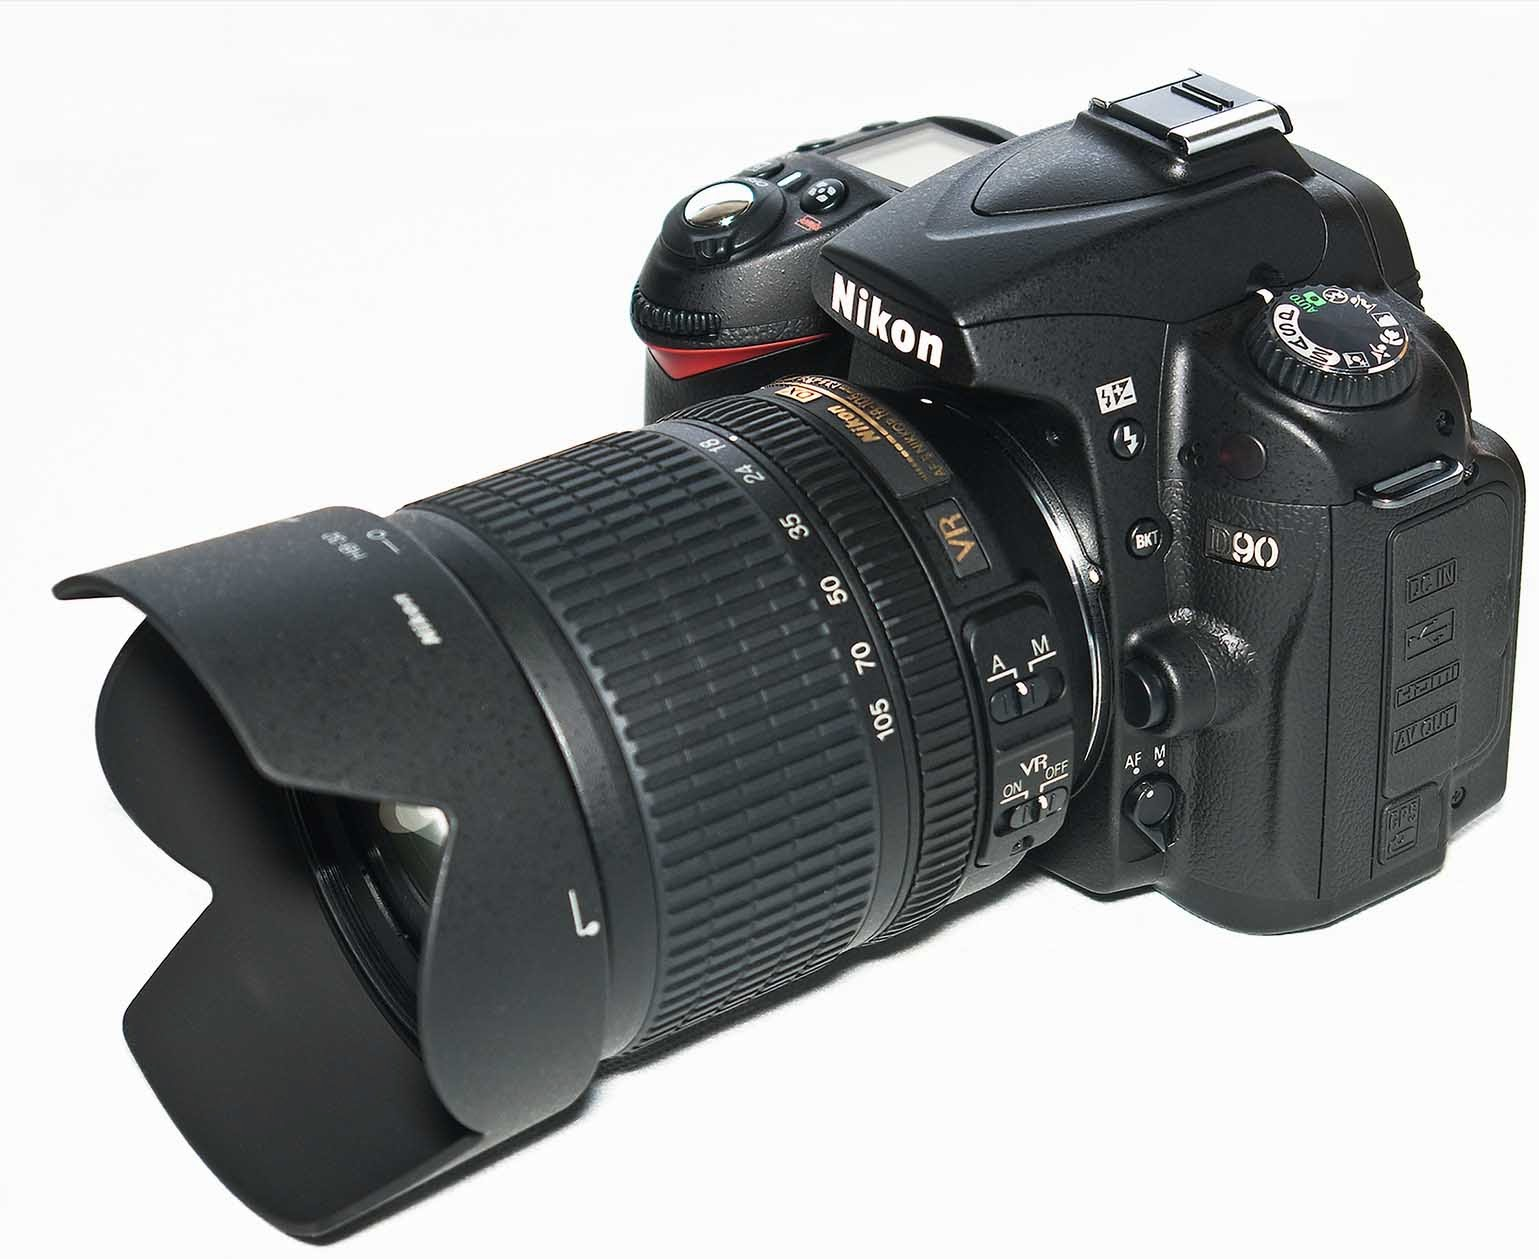 Harga Kamera Nikon 2014 Terbaru Lengkap dengan Spesifikasi